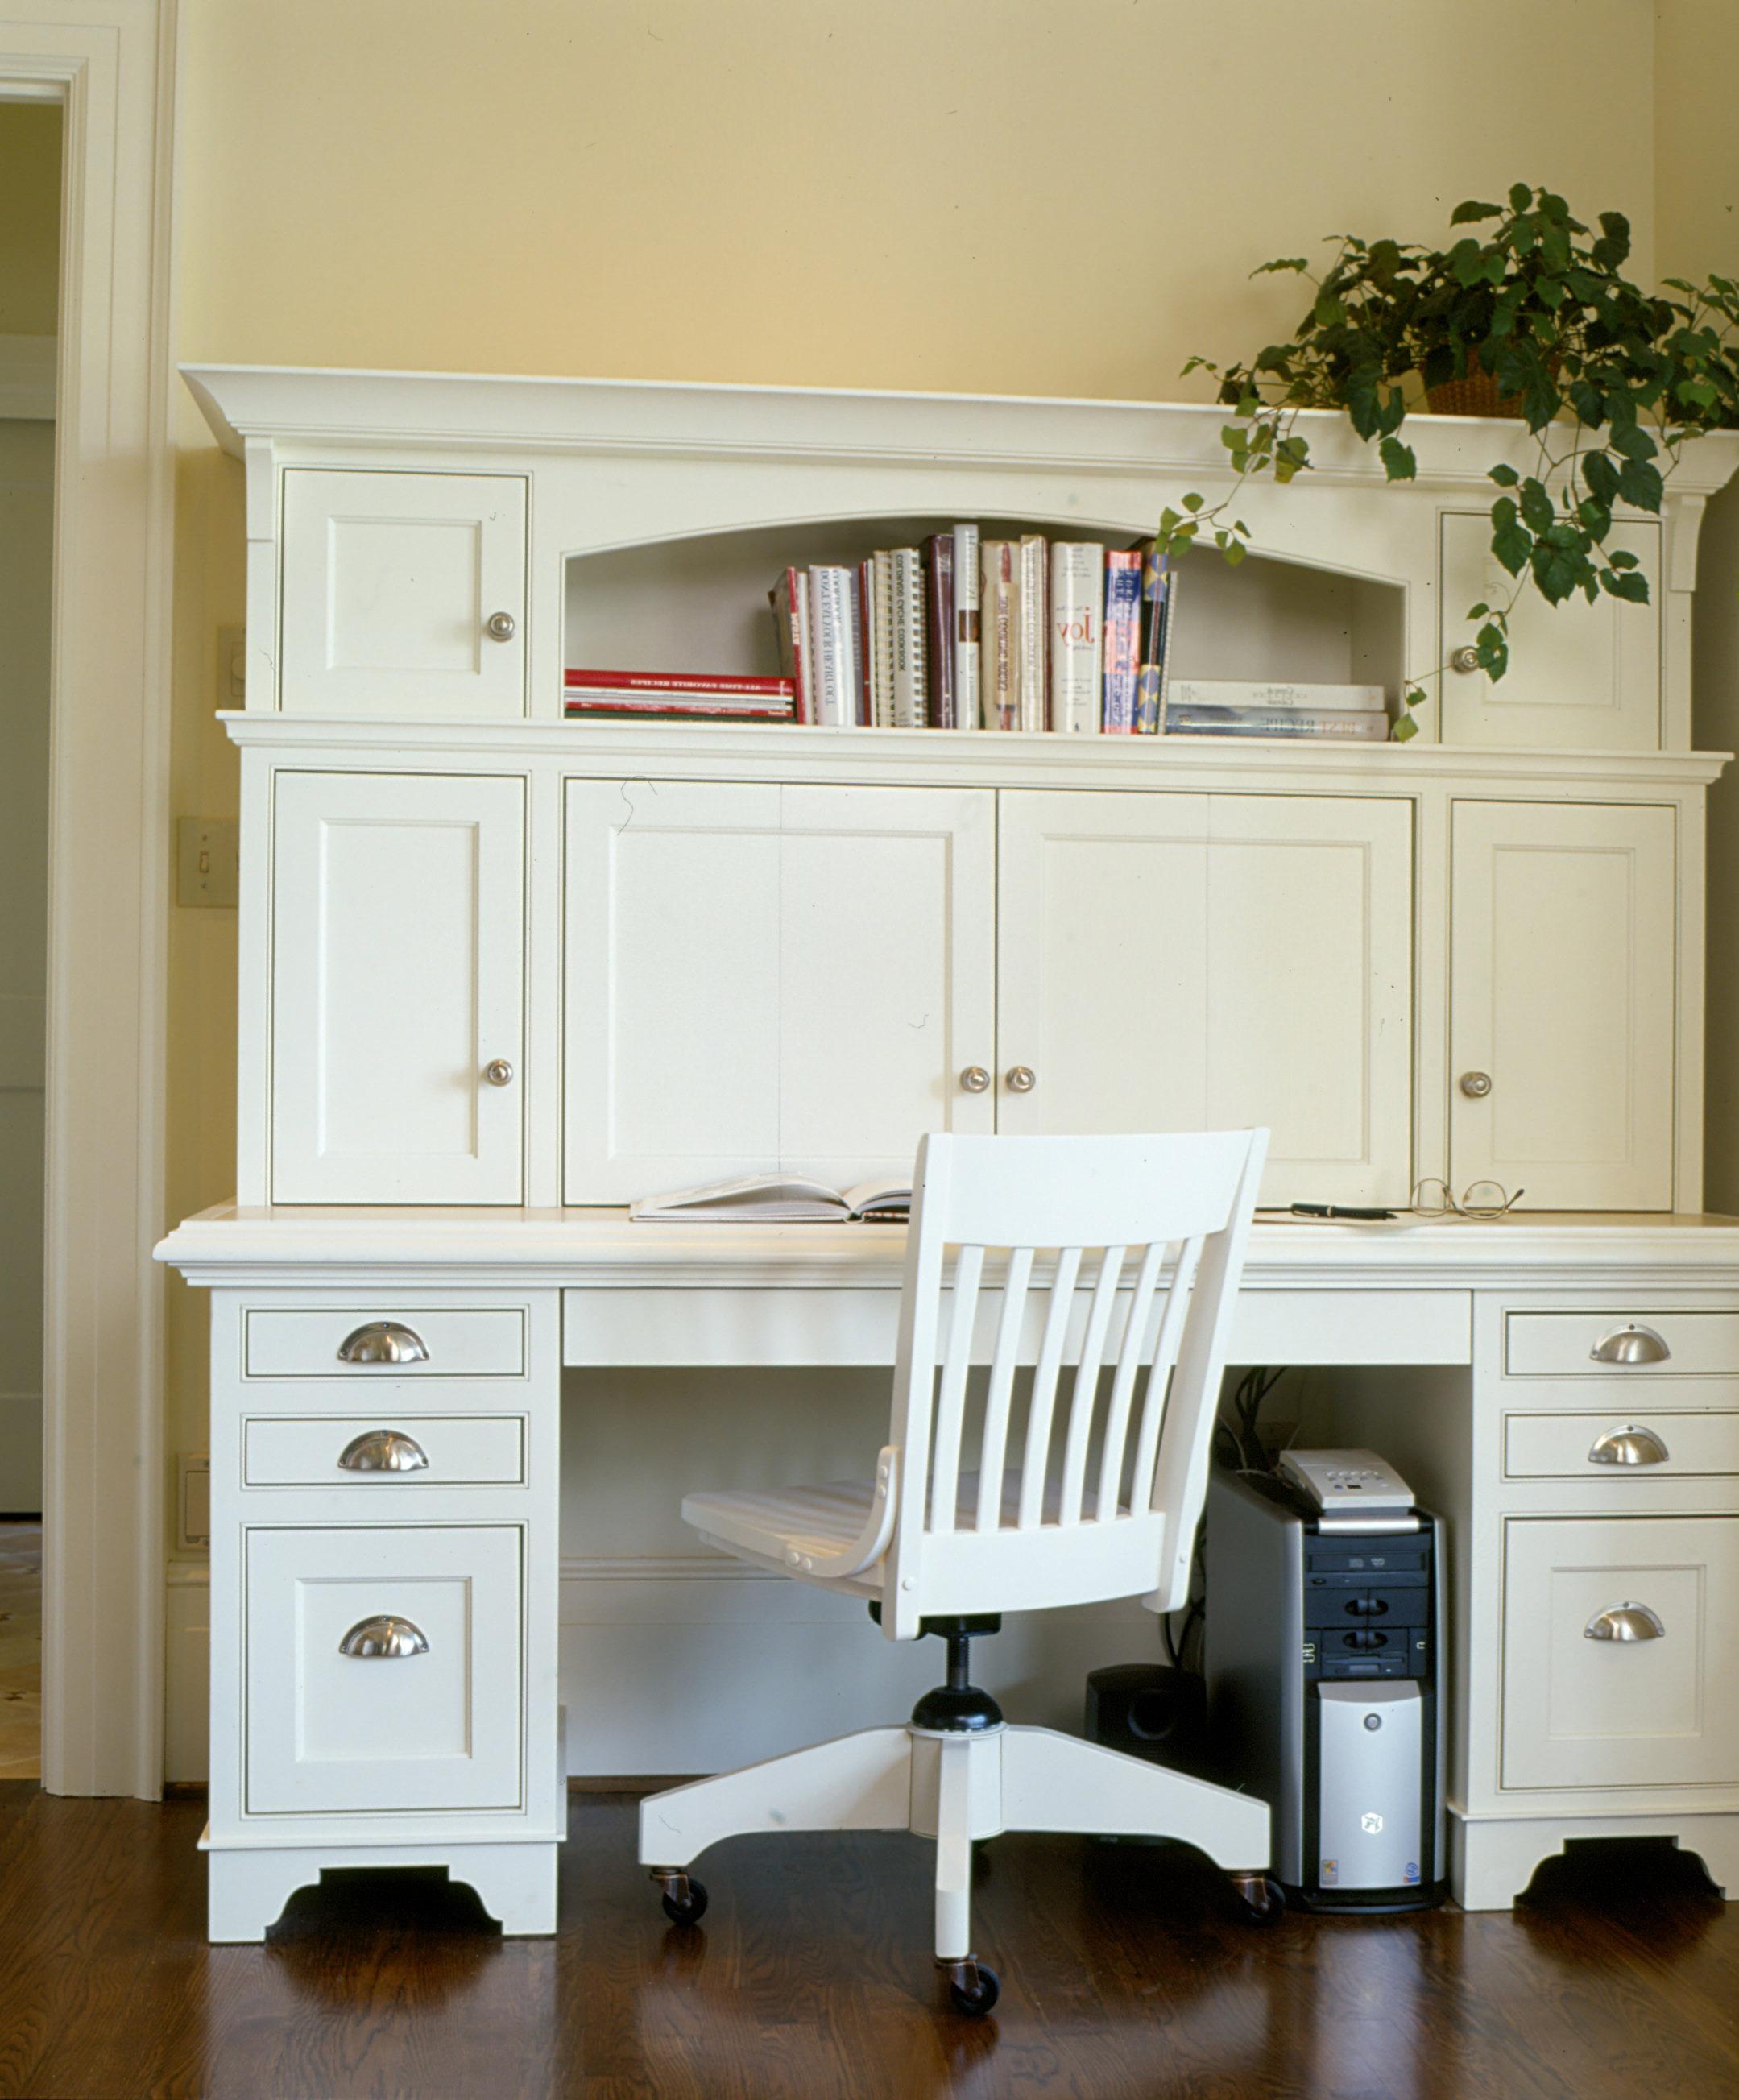 kitchen cabinet outlet ikea kitchens reviews southington ct